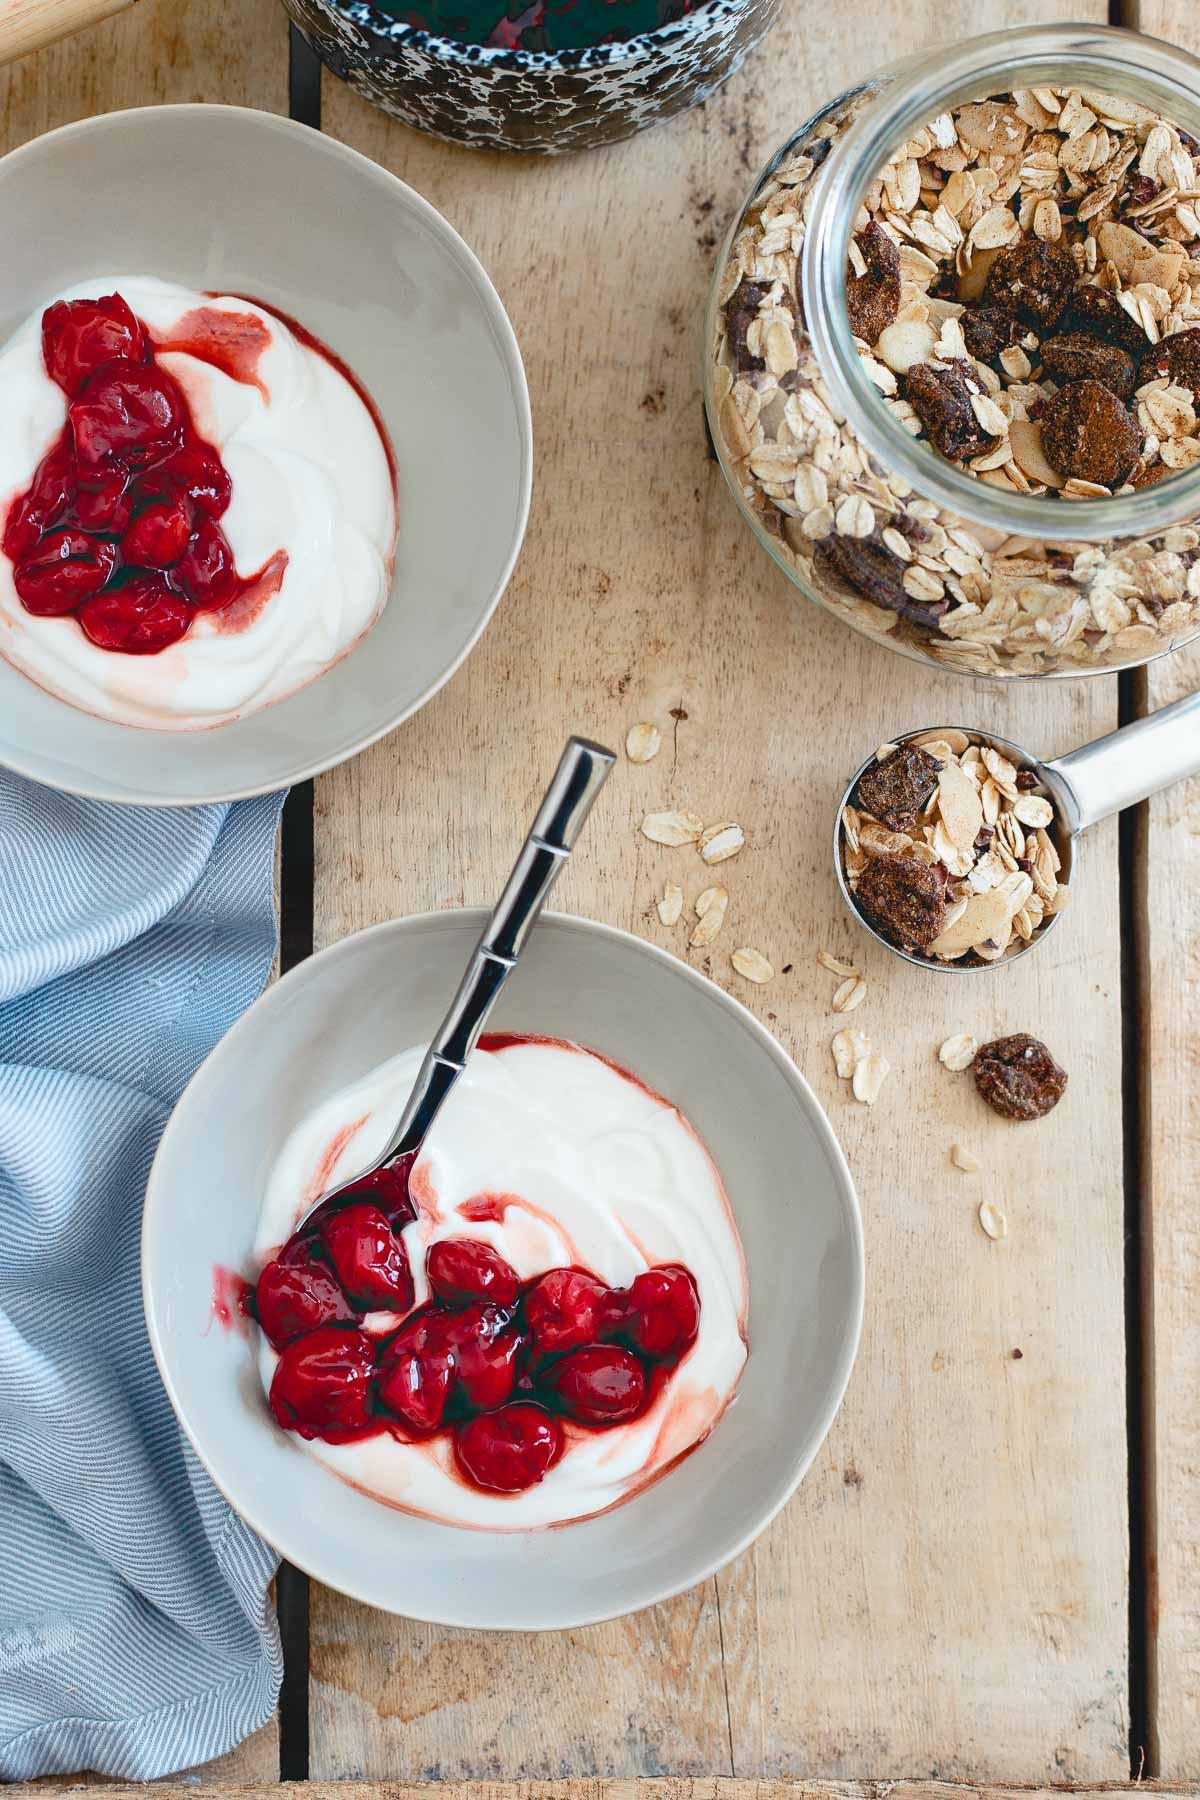 Enjoy this tart cherry ginger muesli over cherry swirled yogurt bowls for an easy, nutritious breakfast.